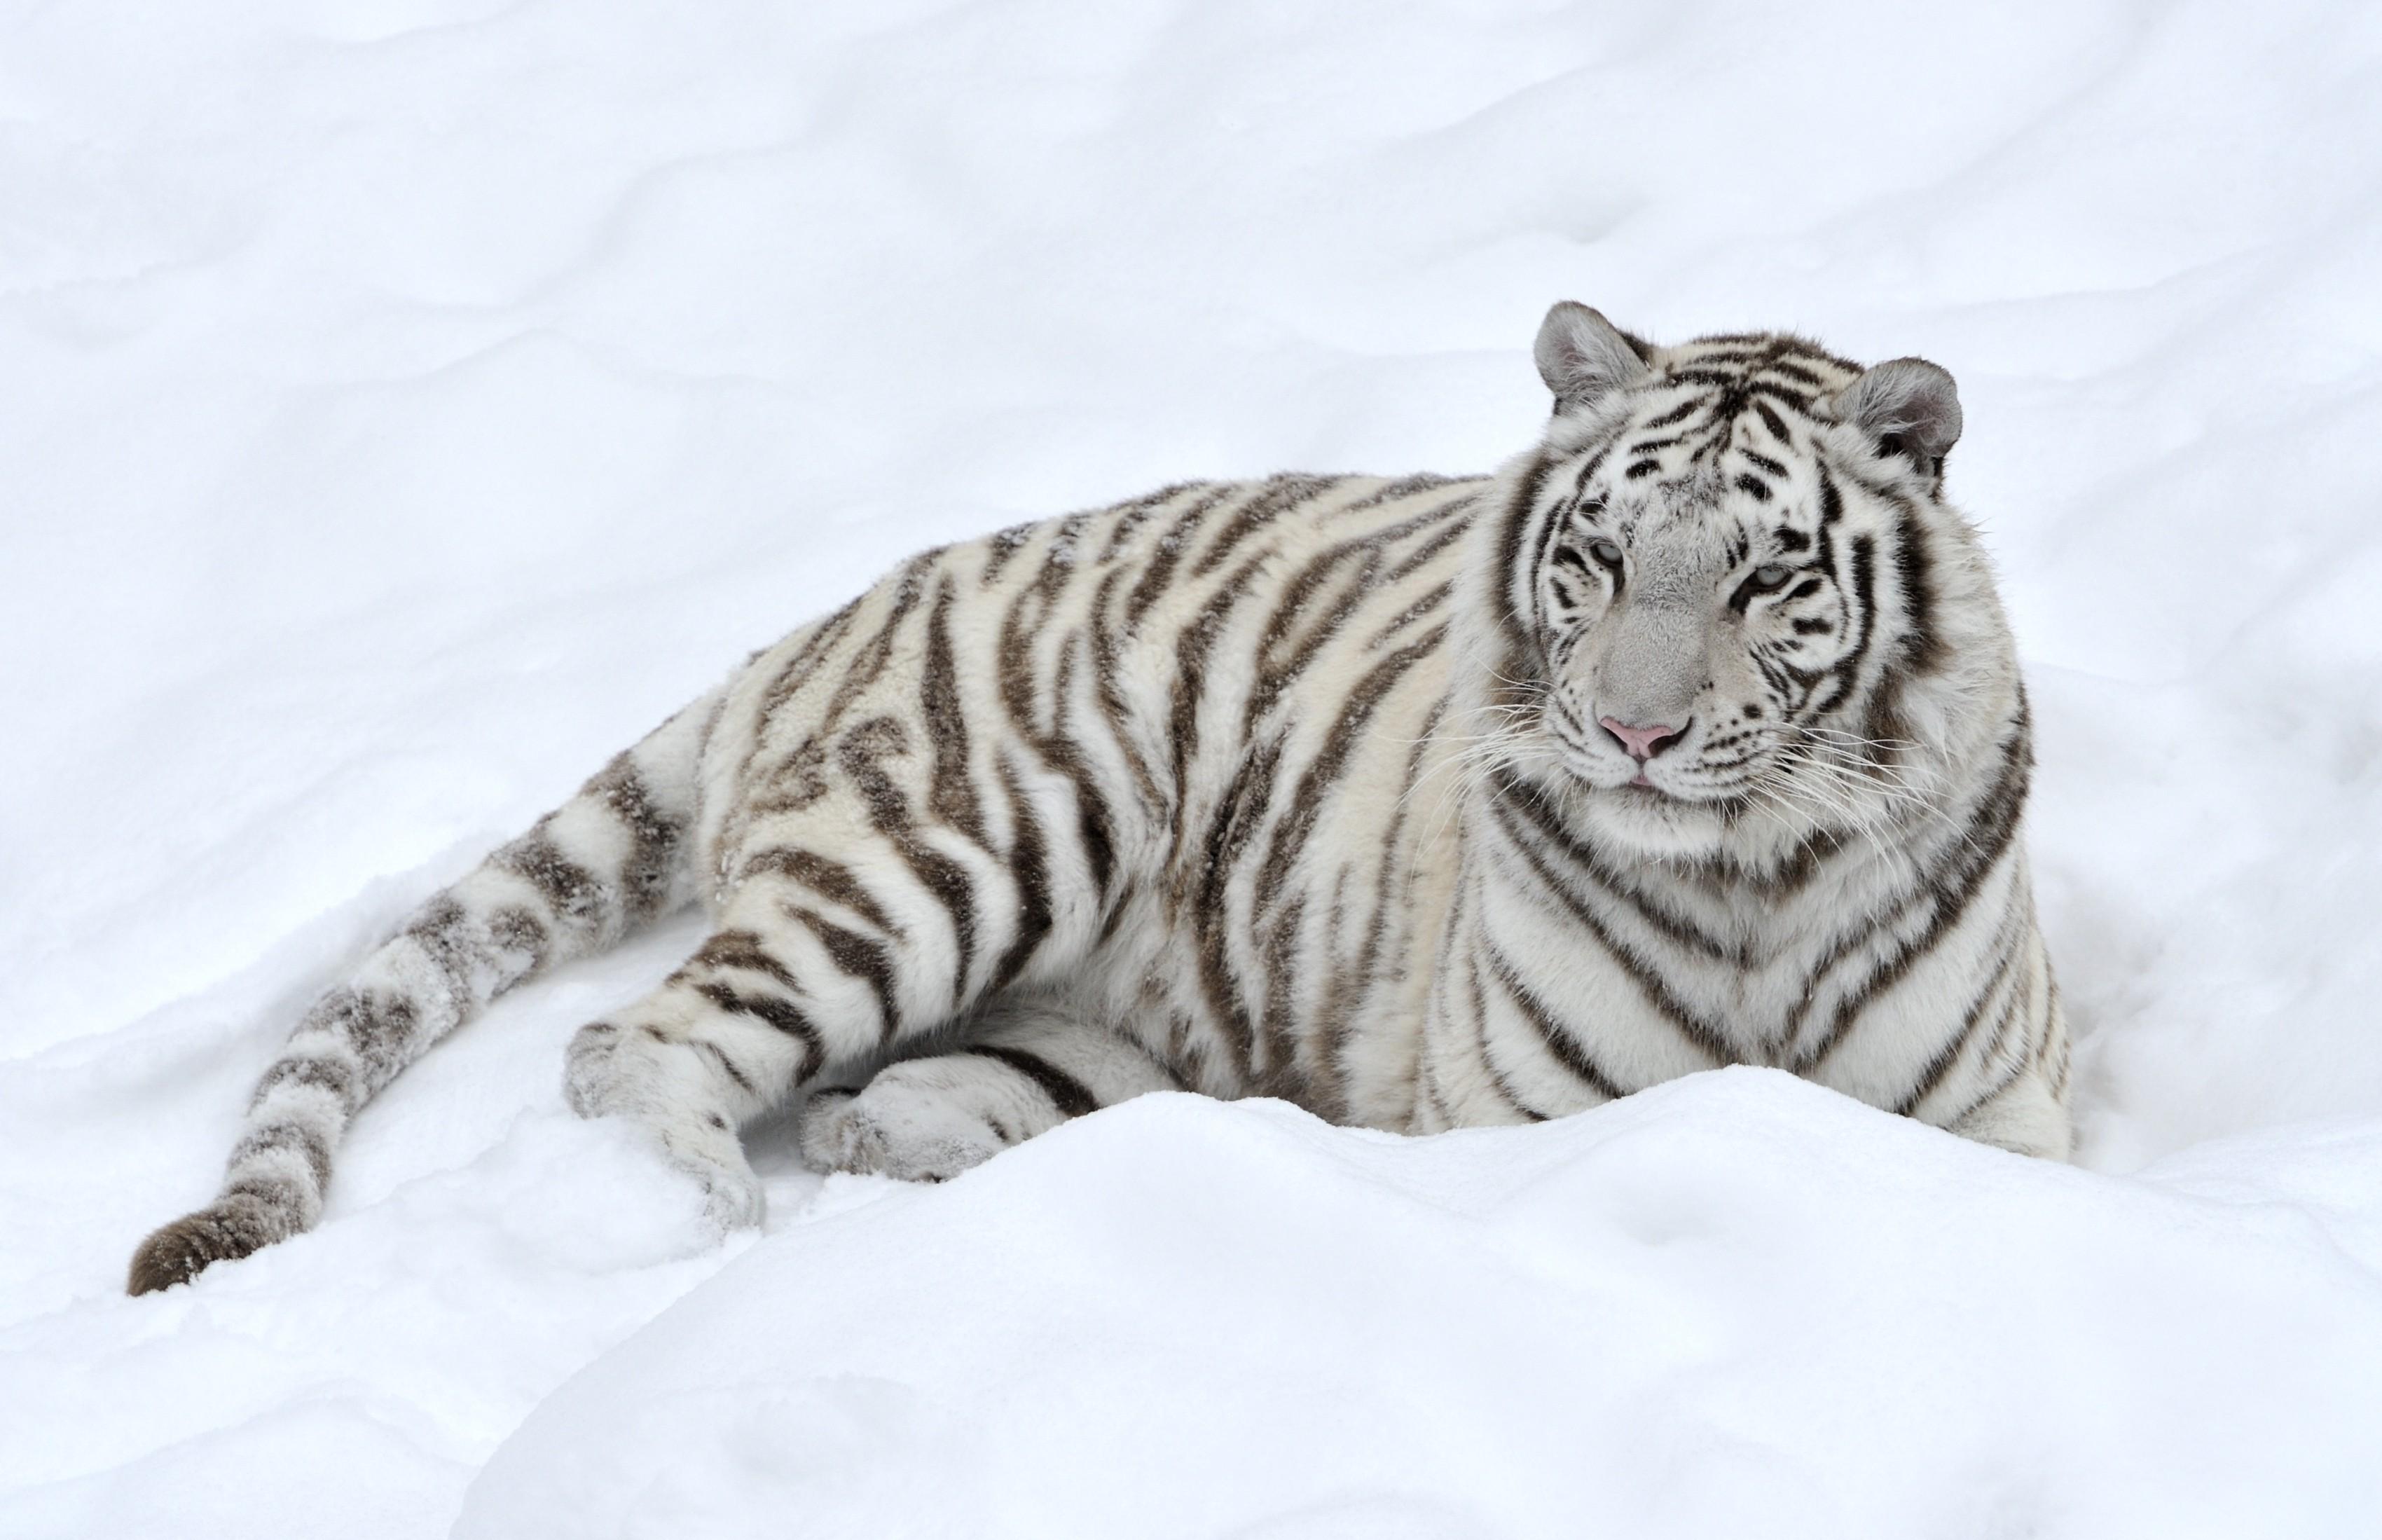 Wallpaper tiger predator snow white wallpapers cats   download 3400x2198